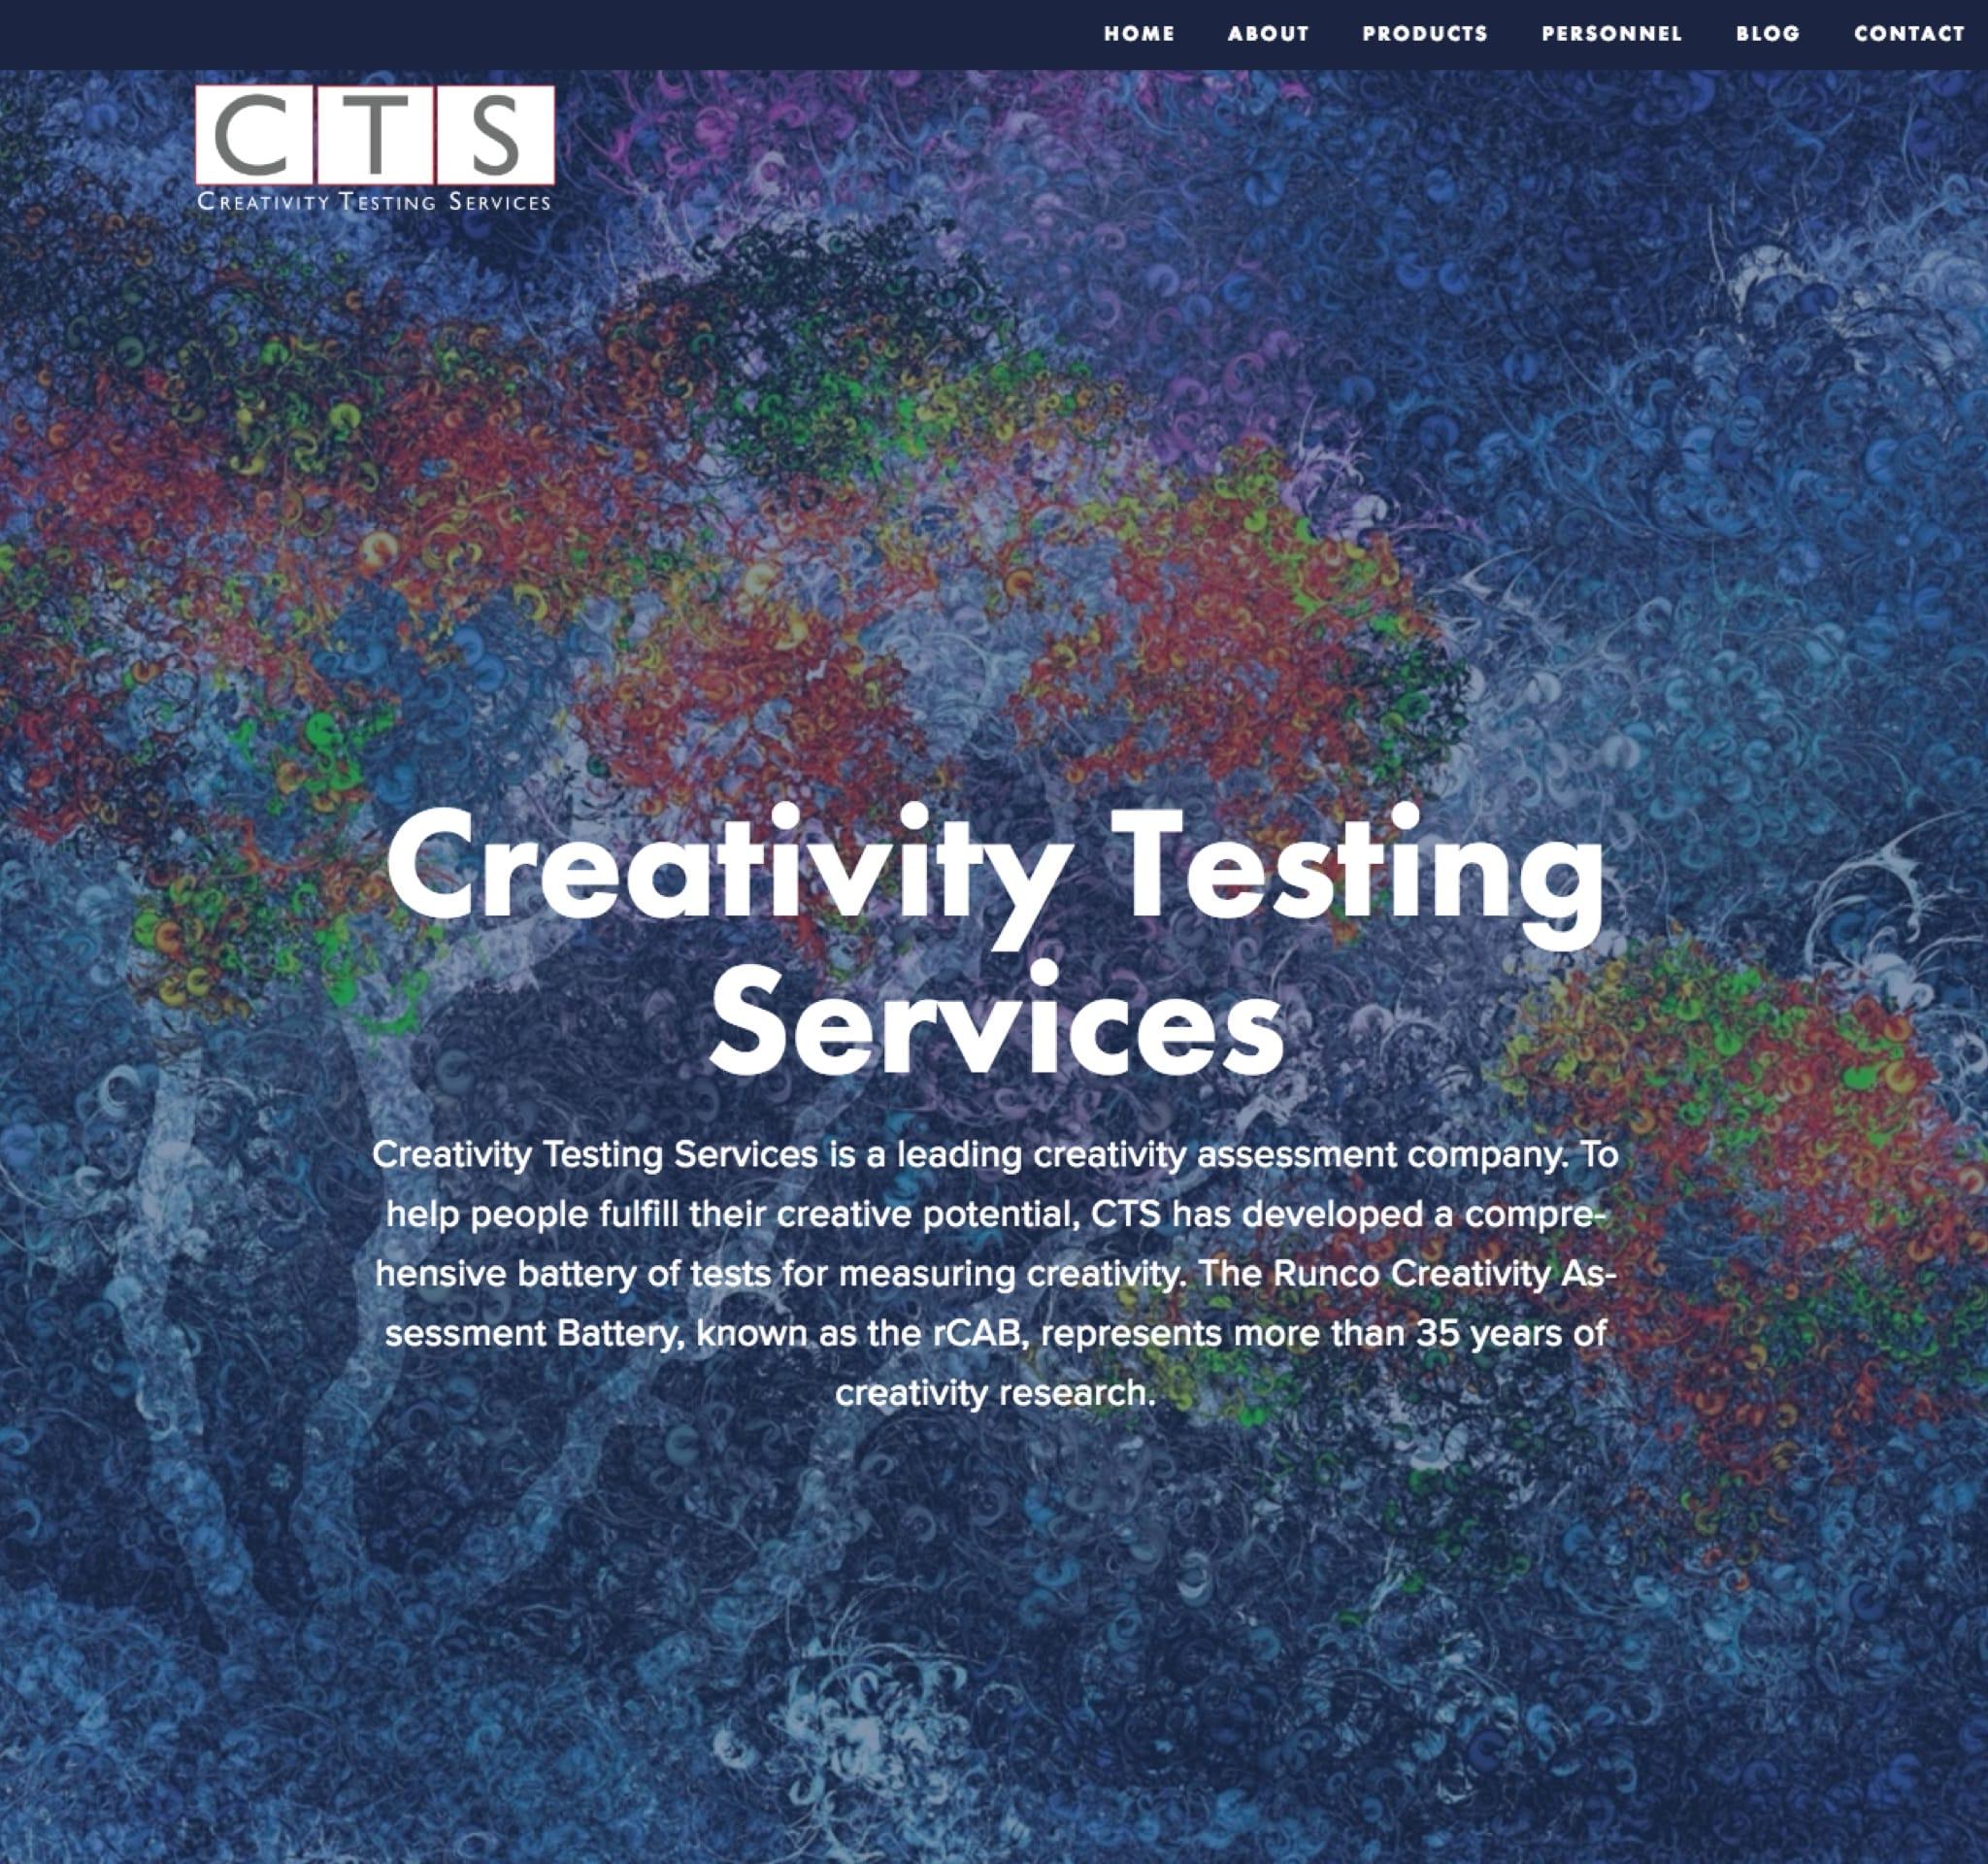 Visit the CTS ScienceSites